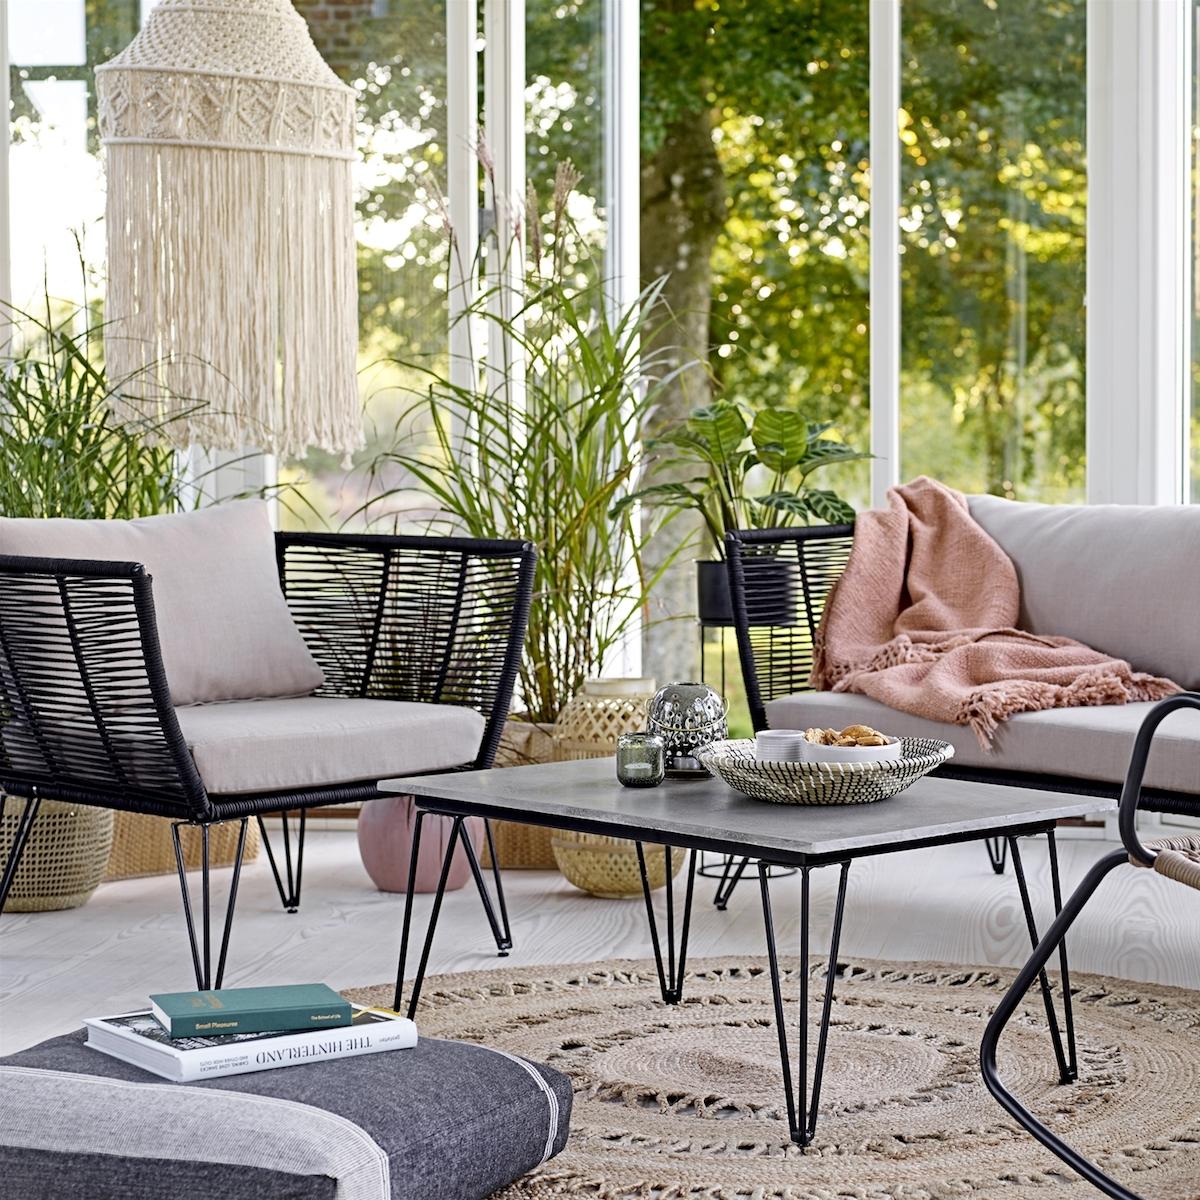 bloomingville lounge sofa outdoor metall schwarz. Black Bedroom Furniture Sets. Home Design Ideas